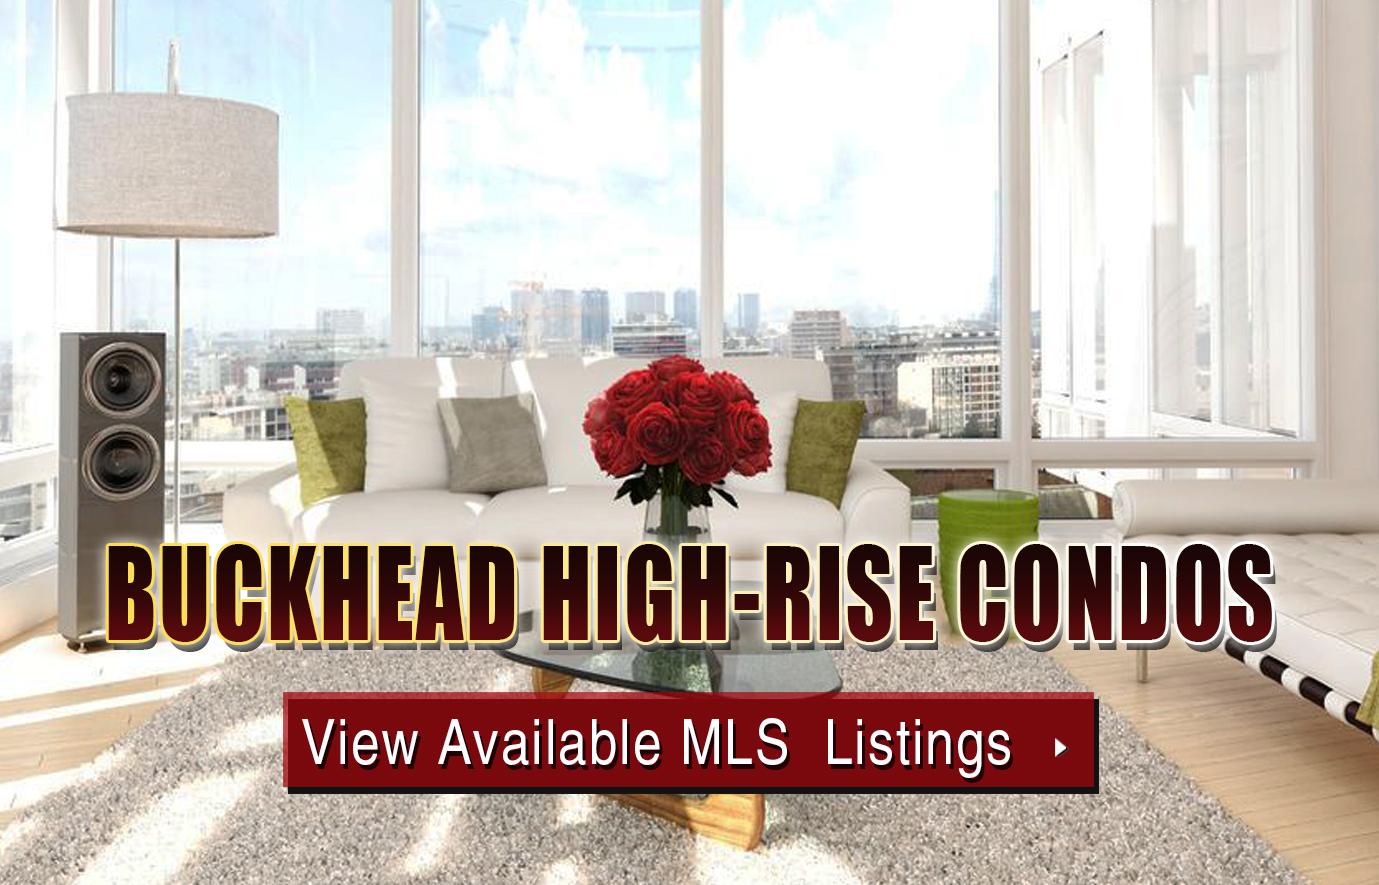 Buckhead High Rise Condos For Sale